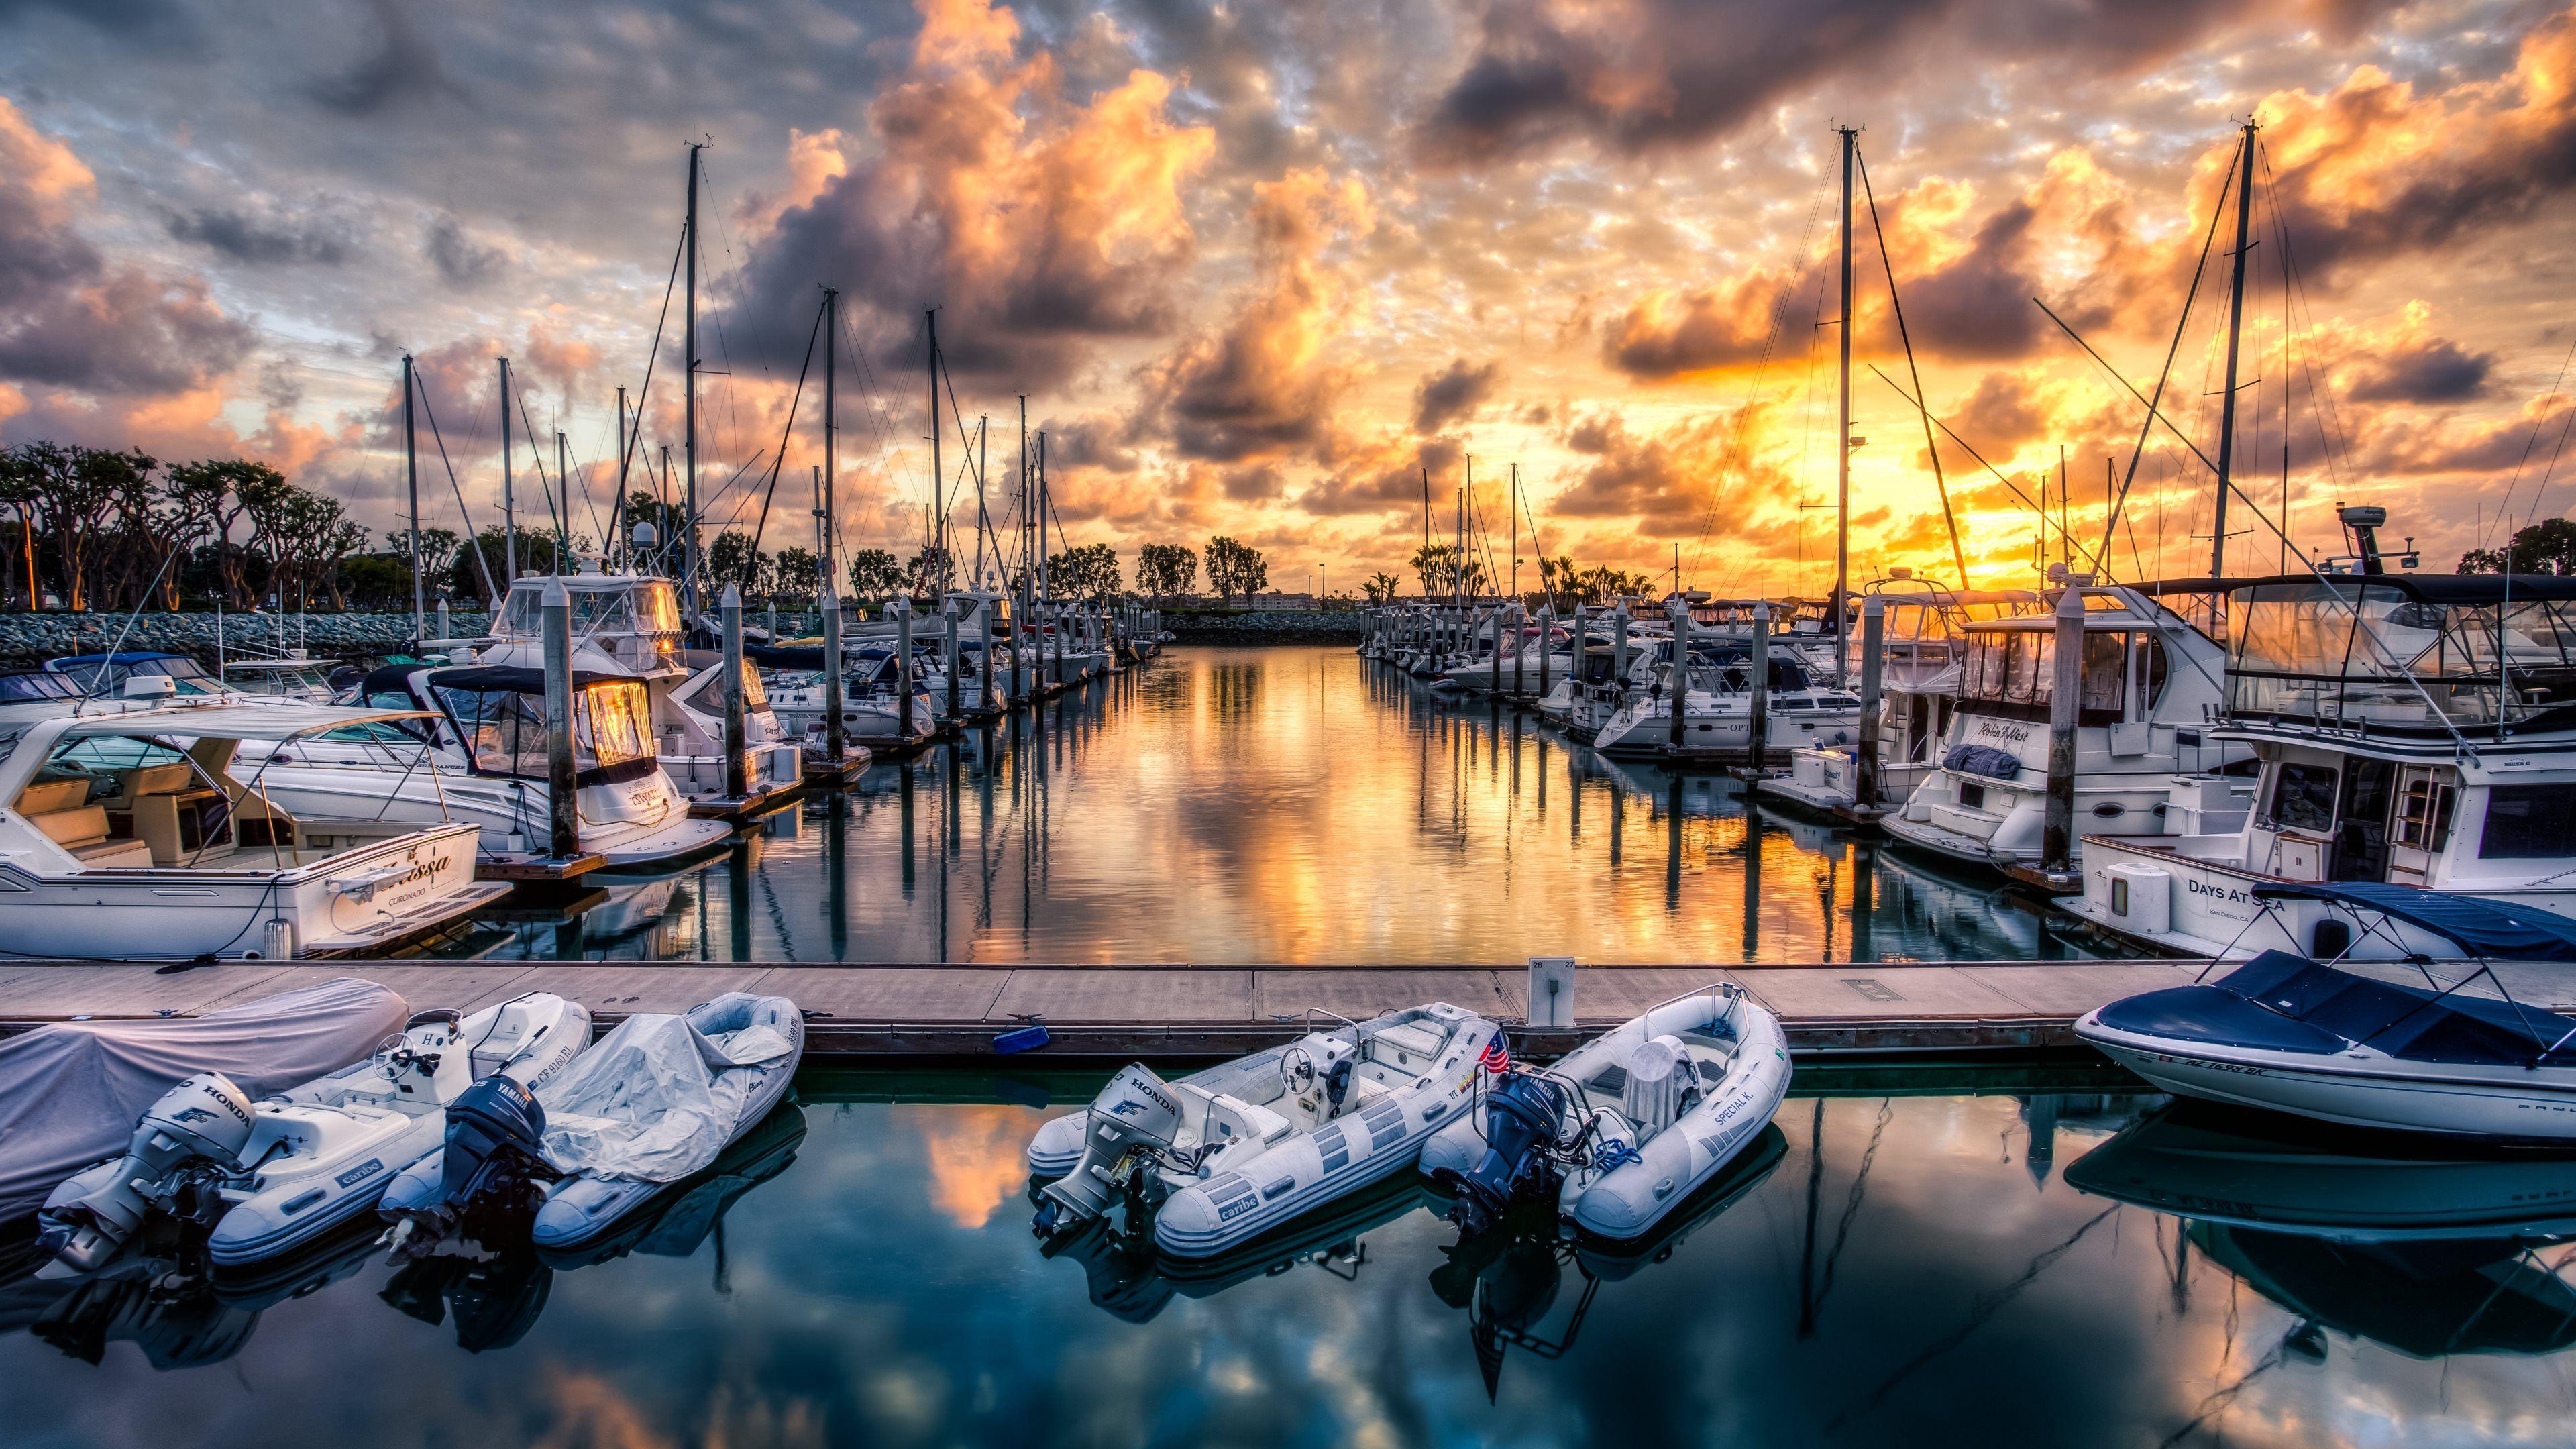 55 Boat Marina Desktop Wallpapers   Download at WallpaperBro 3840x2160